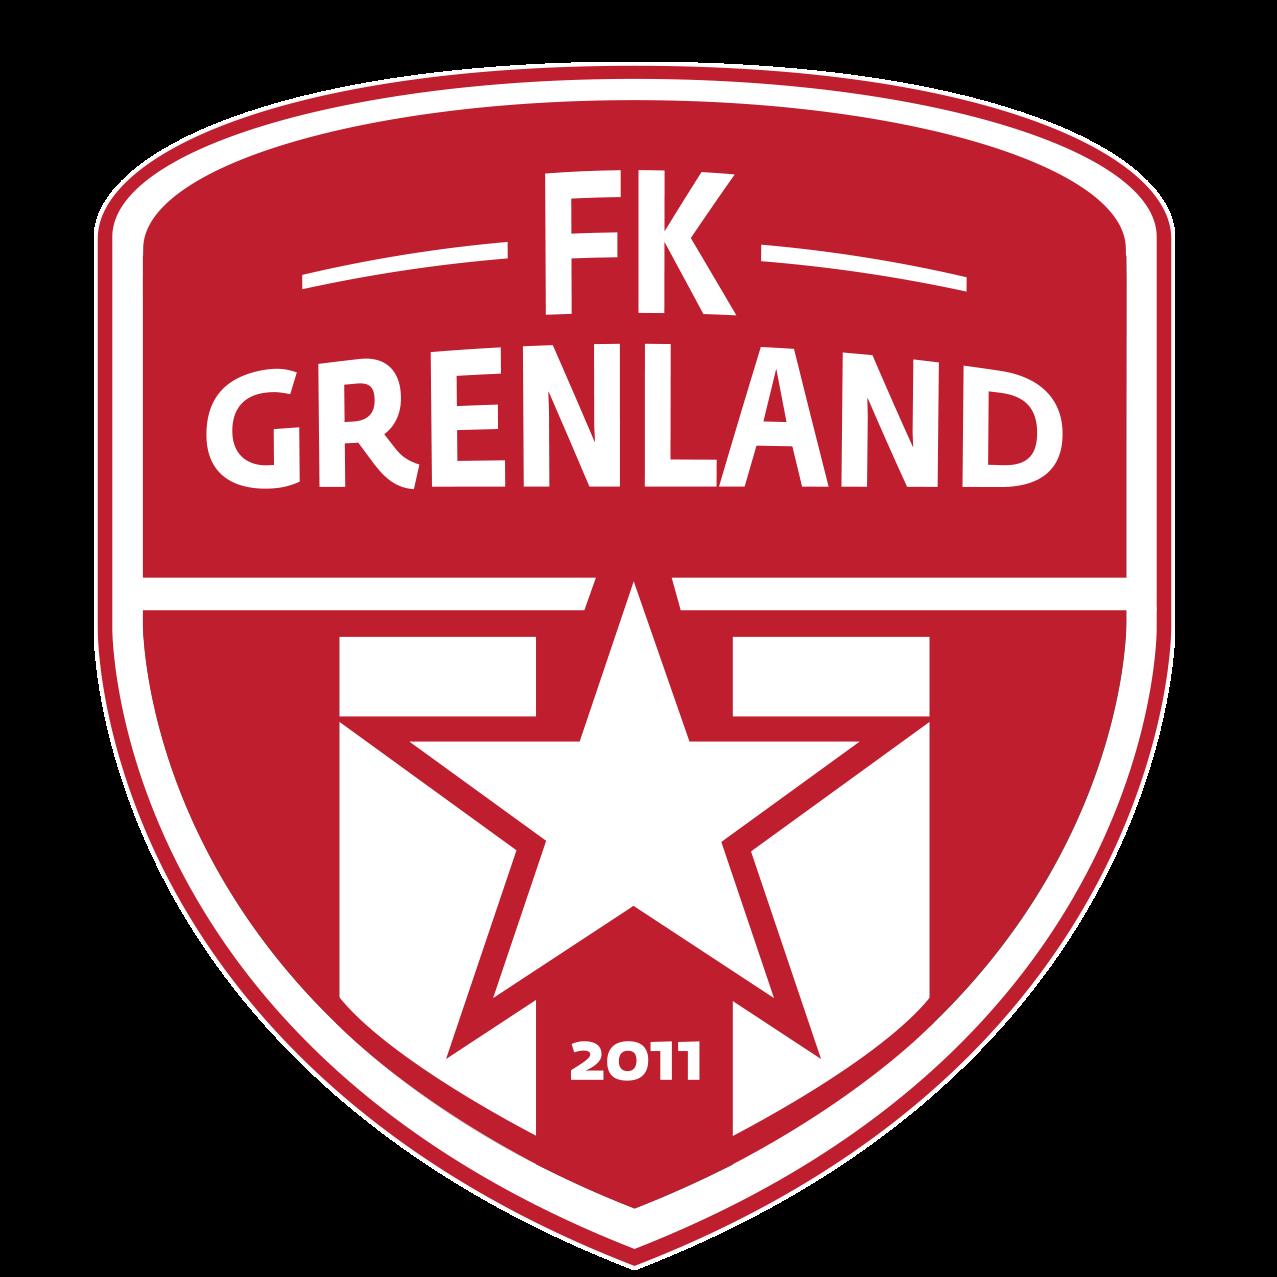 FKGrenland